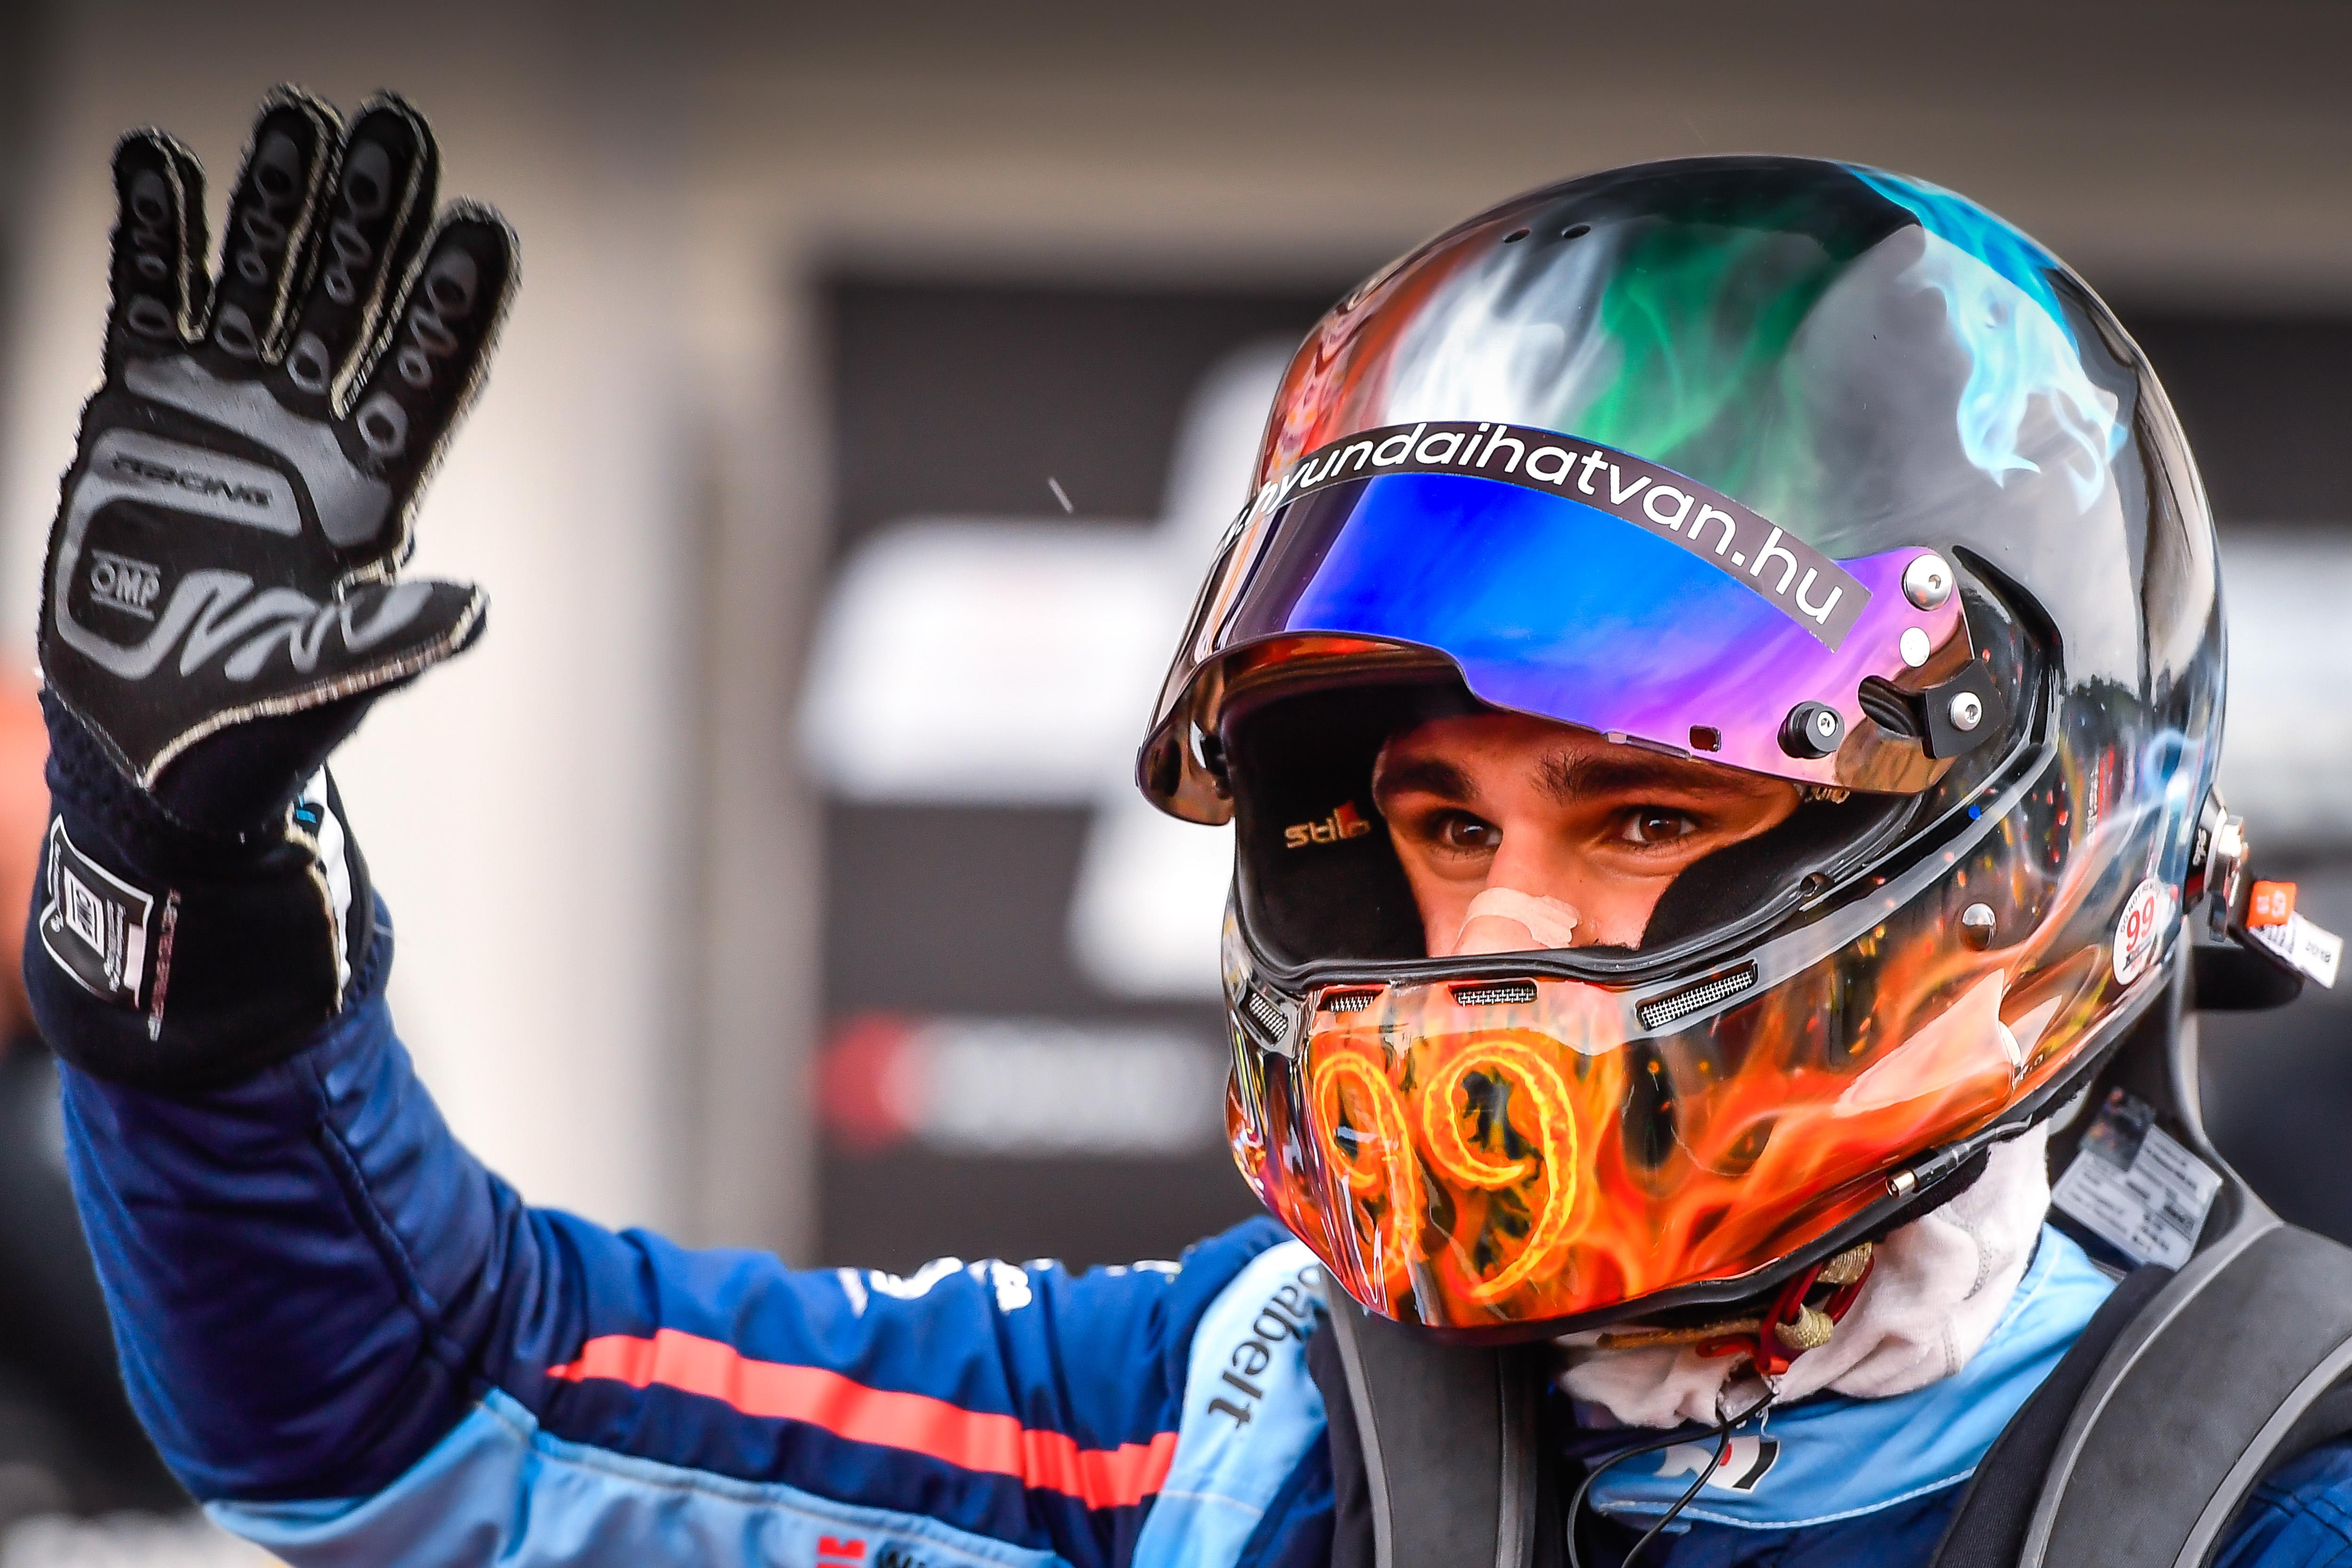 2019-2019_hungaroring_race_2---2019_eur_hungaroring_r2_99_daniel_nagy_8.jpg